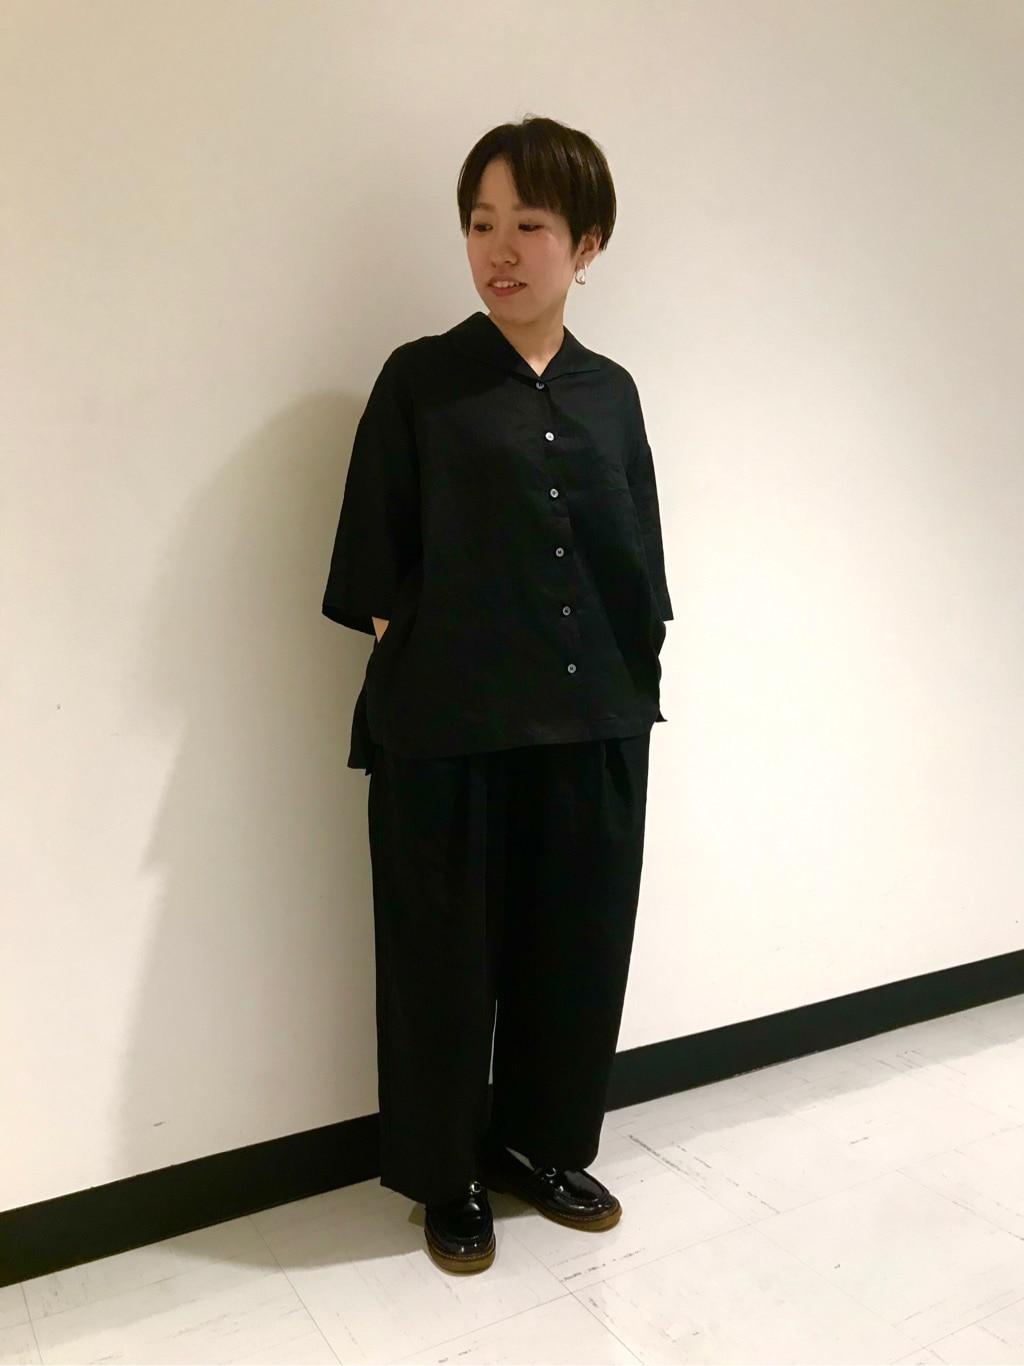 bulle de savon なんばシティ 身長:148cm 2020.03.11